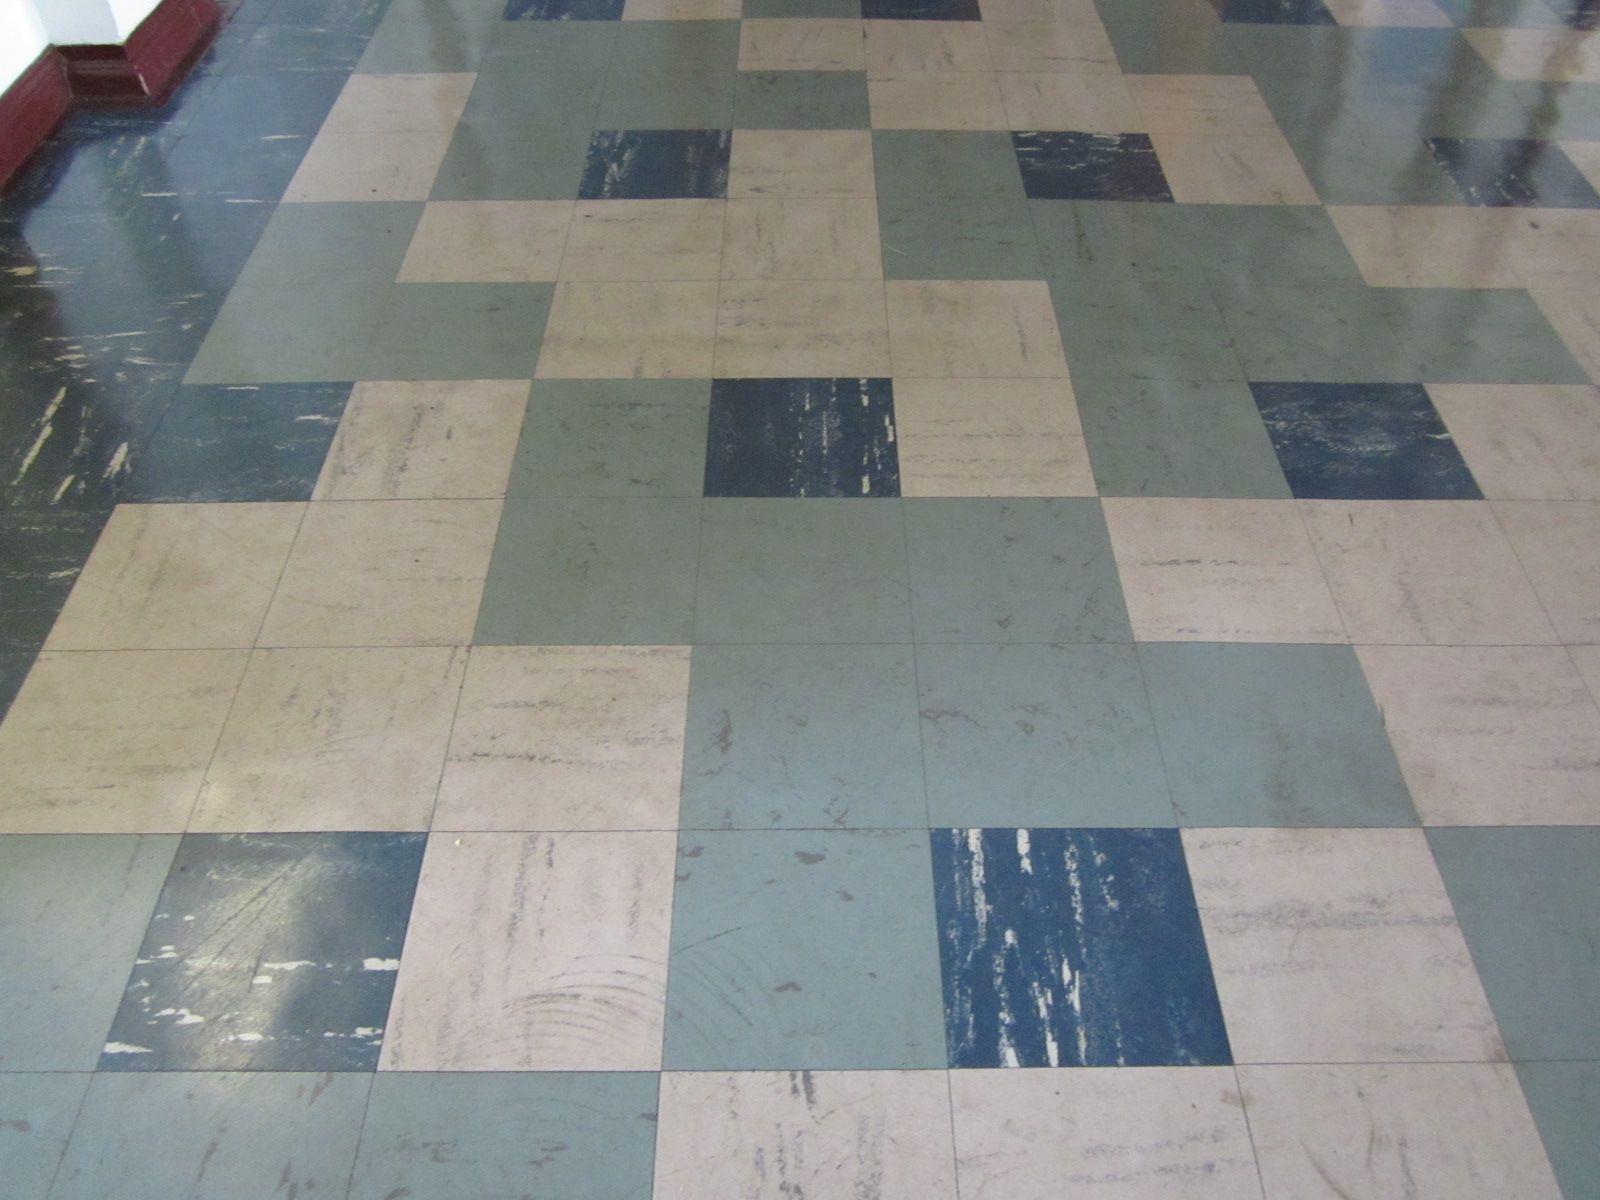 Asbestos containing vinyl tiles Tile floor, Vinyl tiles